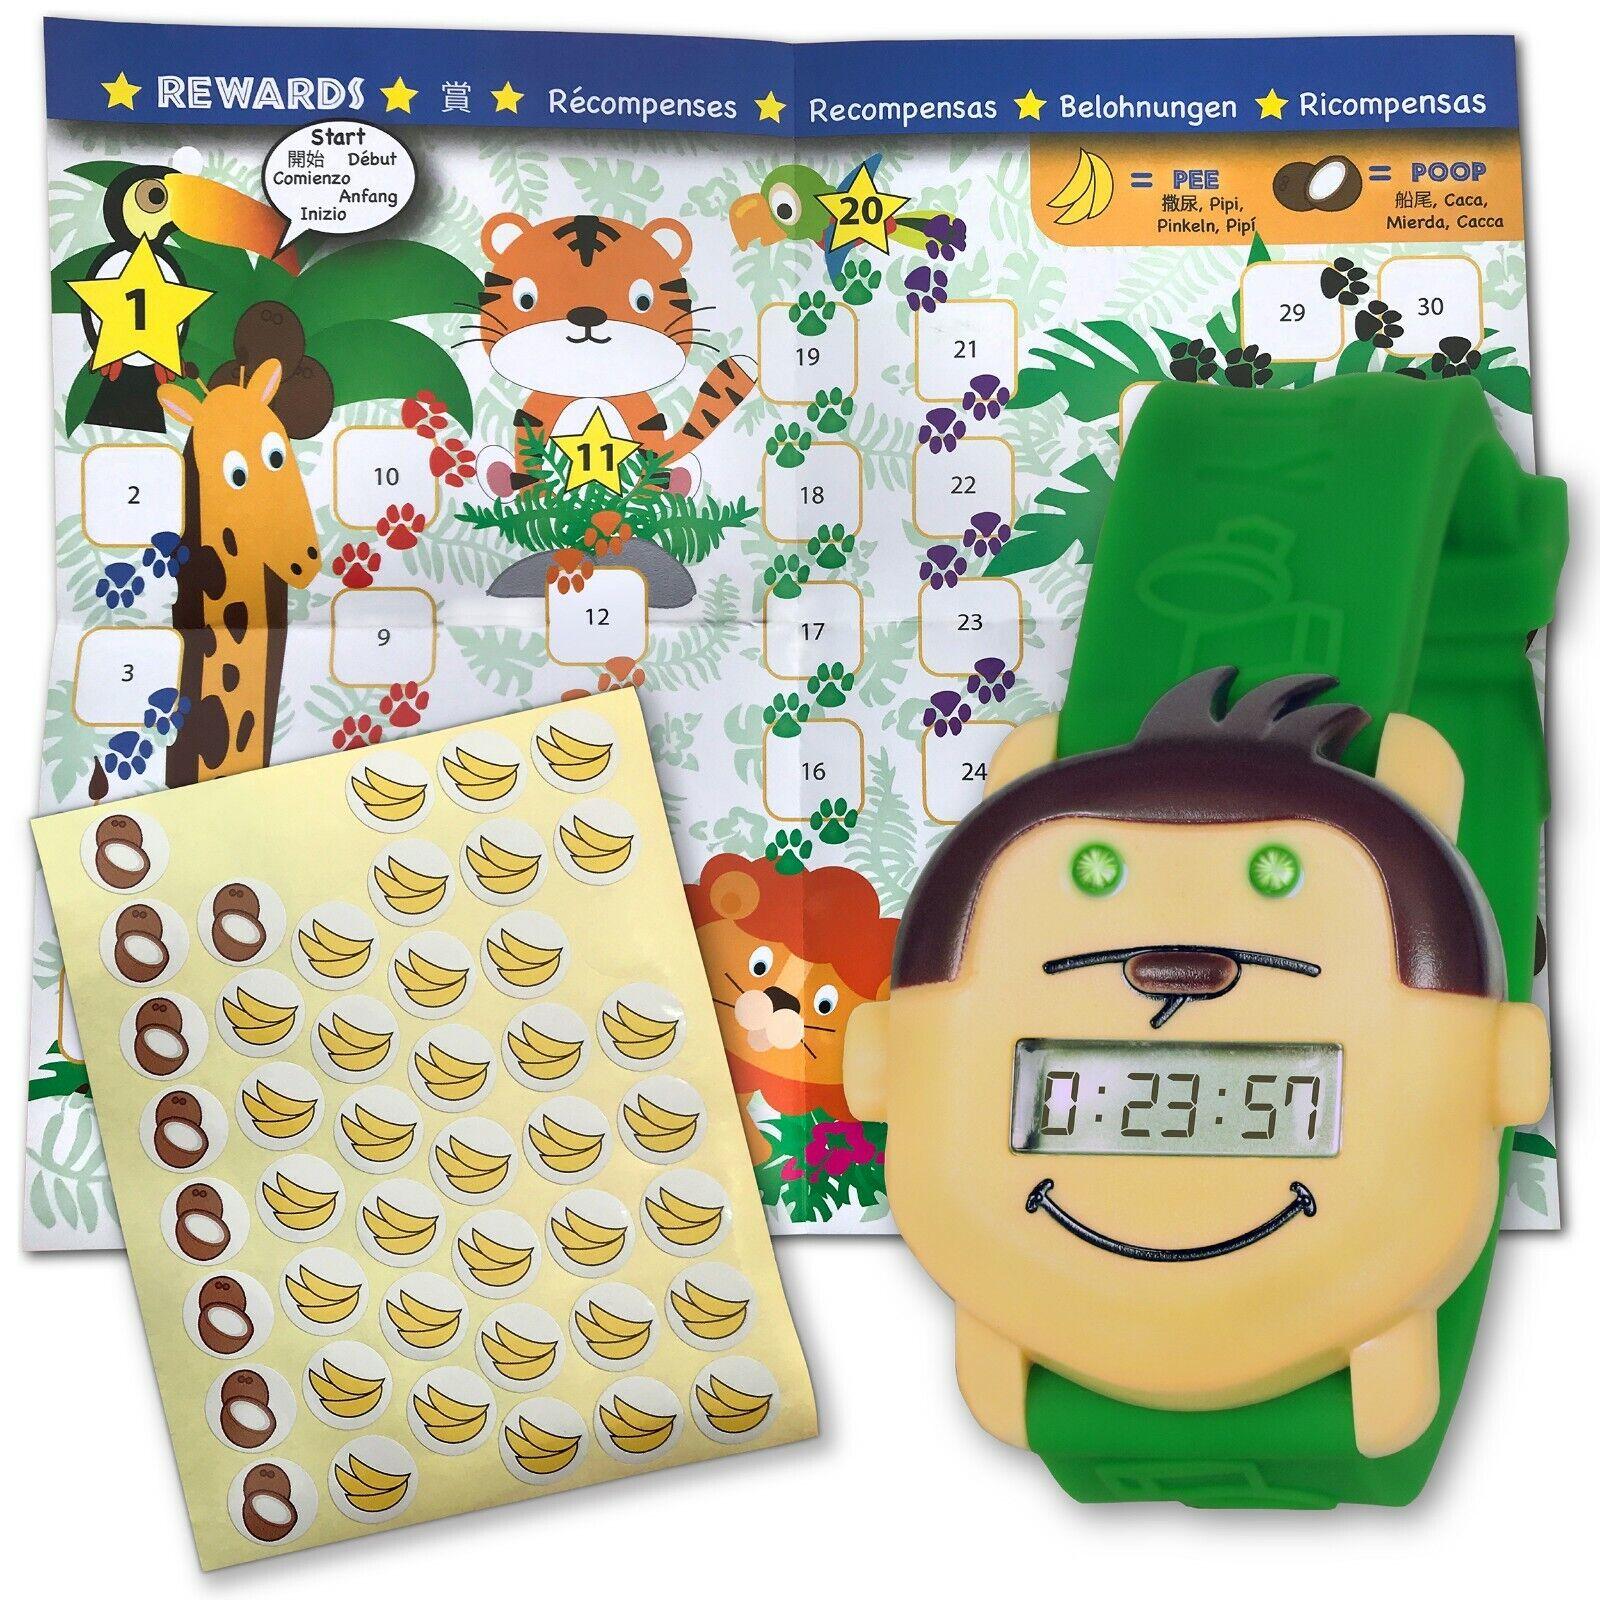 Potty Monkey Watch | Potty Training Reminder Watch w/ Colorful Fun Reward Chart